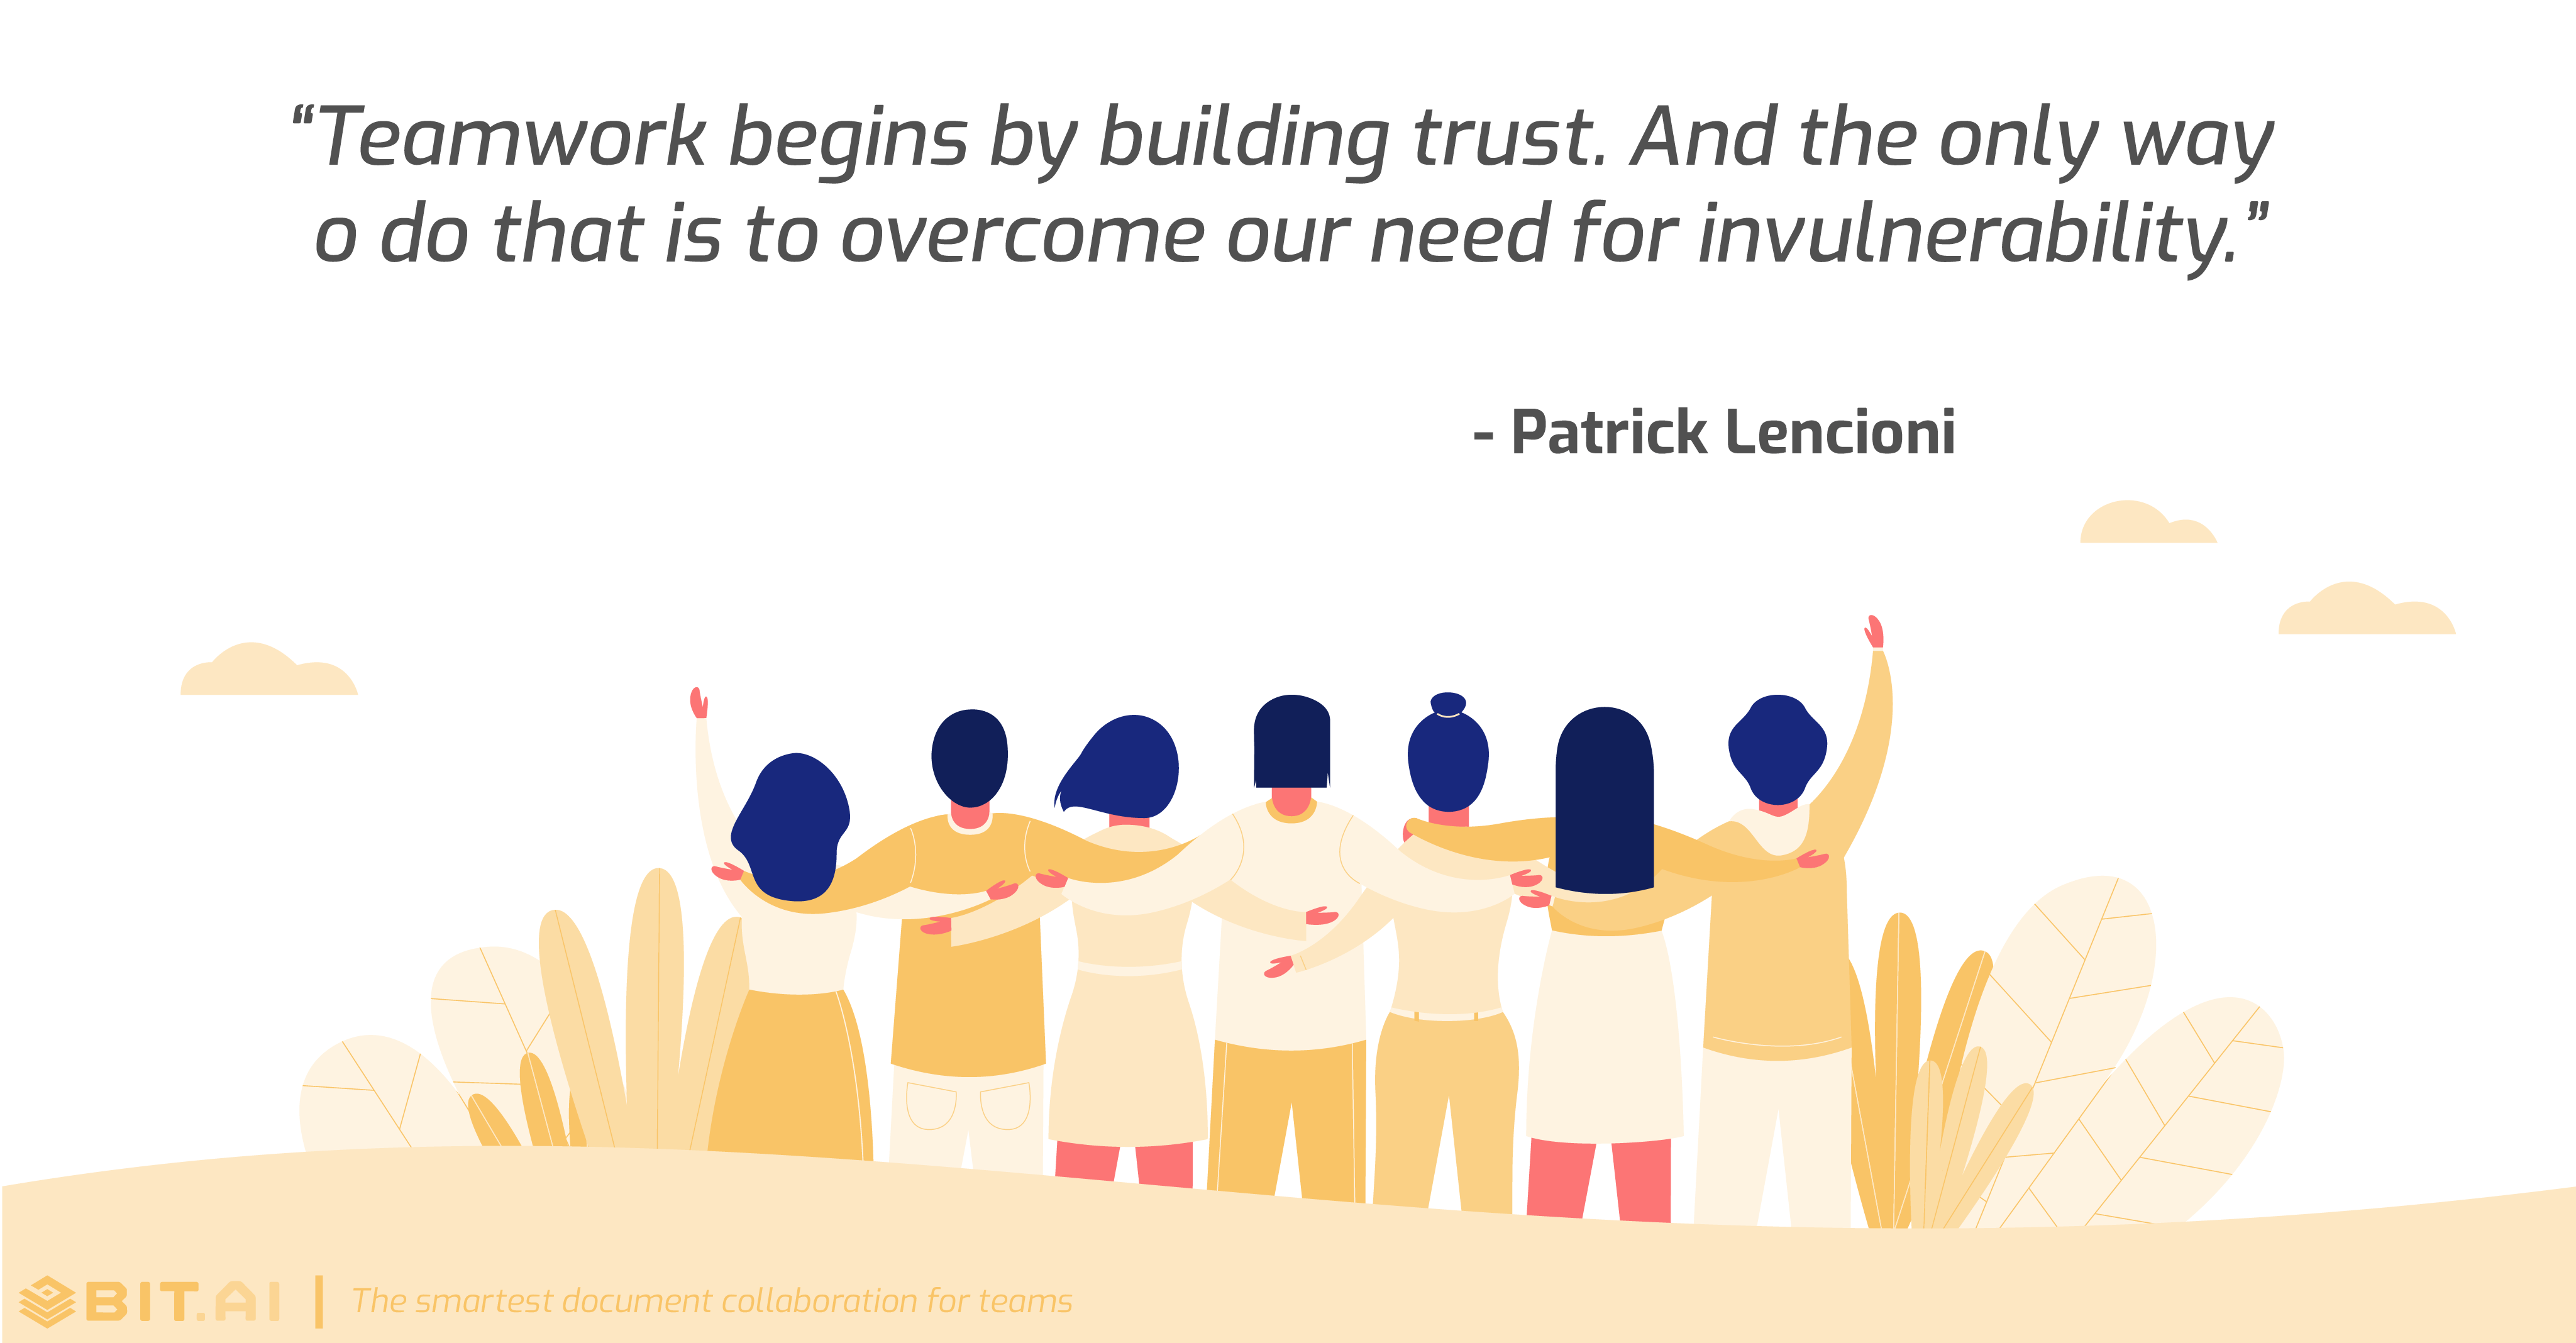 Teamwork collaboration quote by Patrick Lencioni